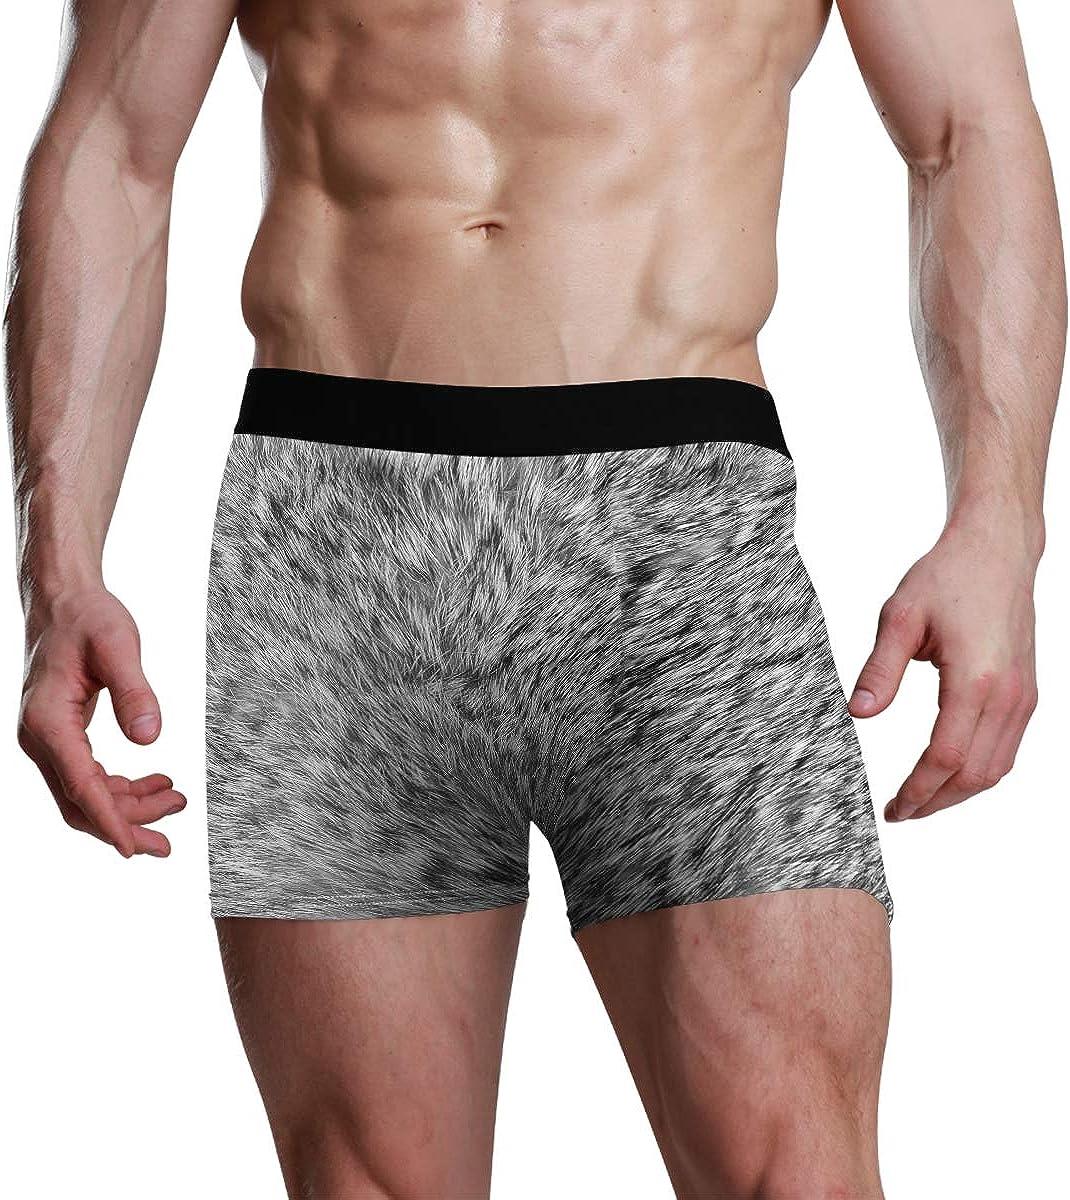 Mens Boxer Briefs Grey Plush Low Rise Trunks Underwear Breathable Bikini Boys